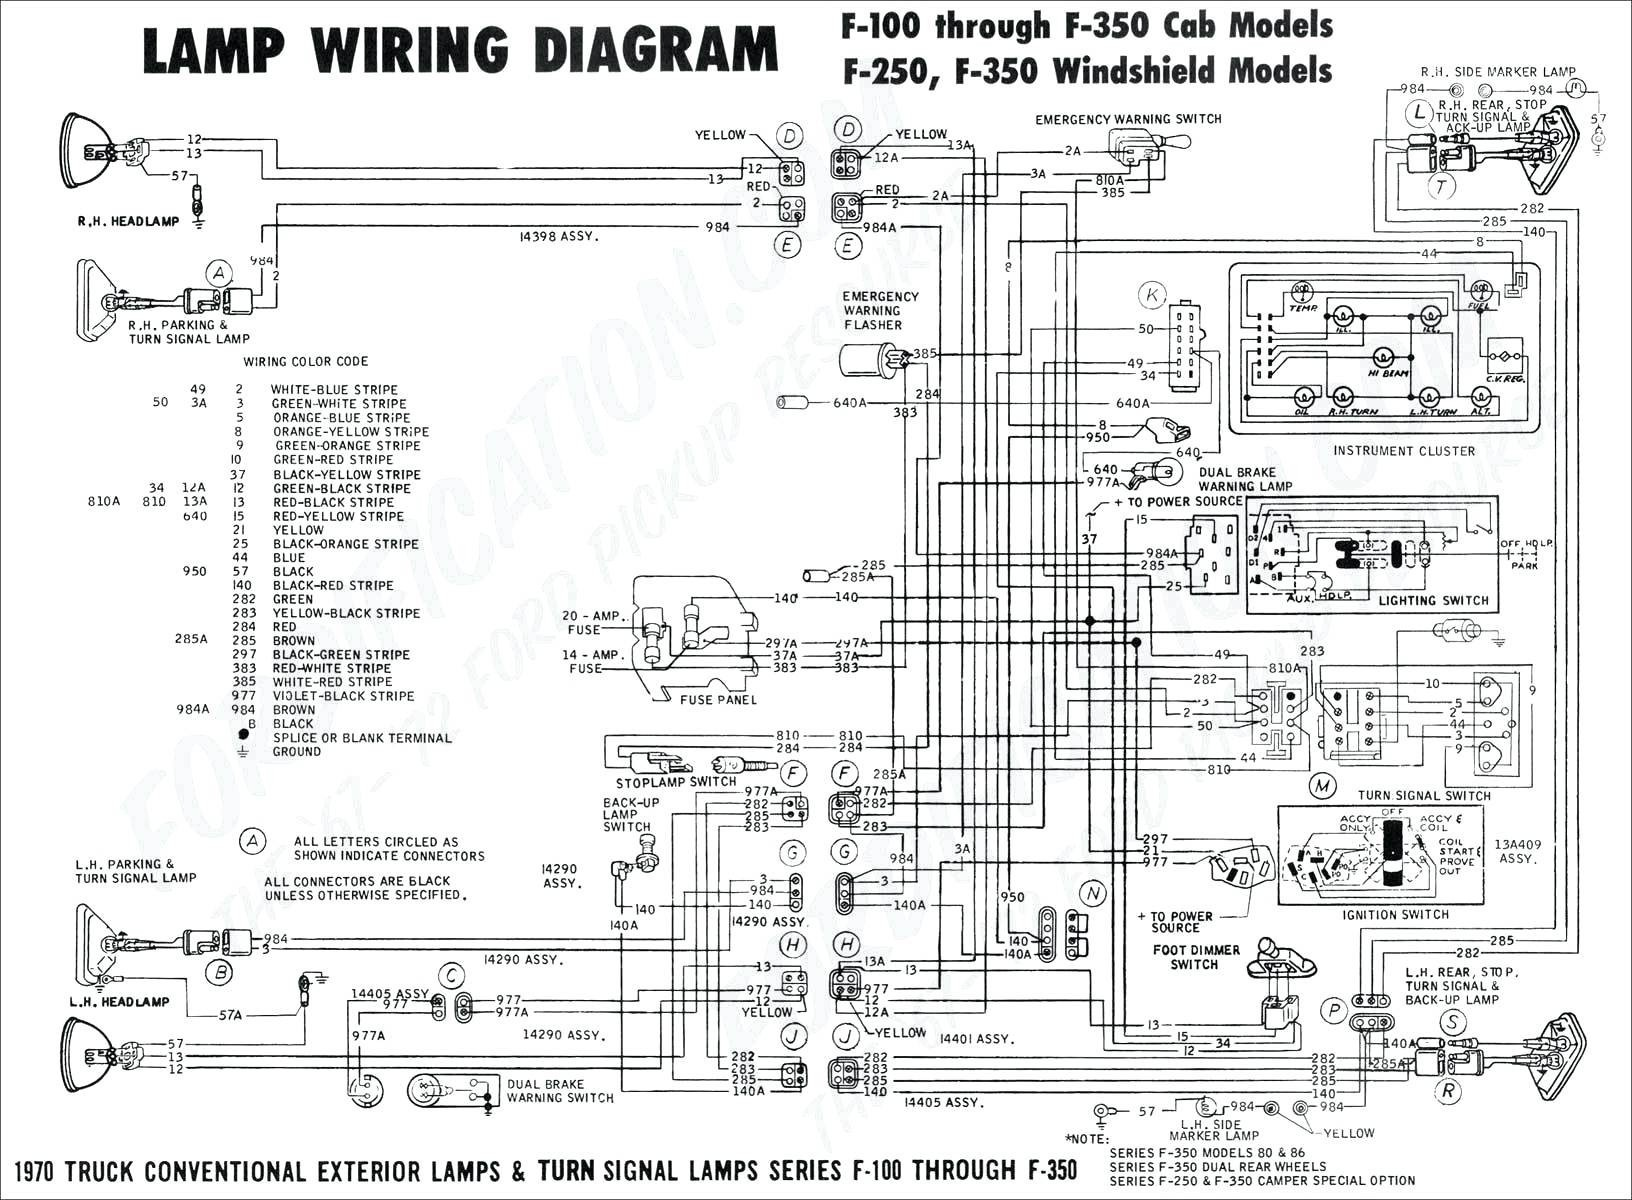 Car Engine Layout Diagram 03 Taurus Ac Wiring Diagram Another Blog About Wiring Diagram • Of Car Engine Layout Diagram